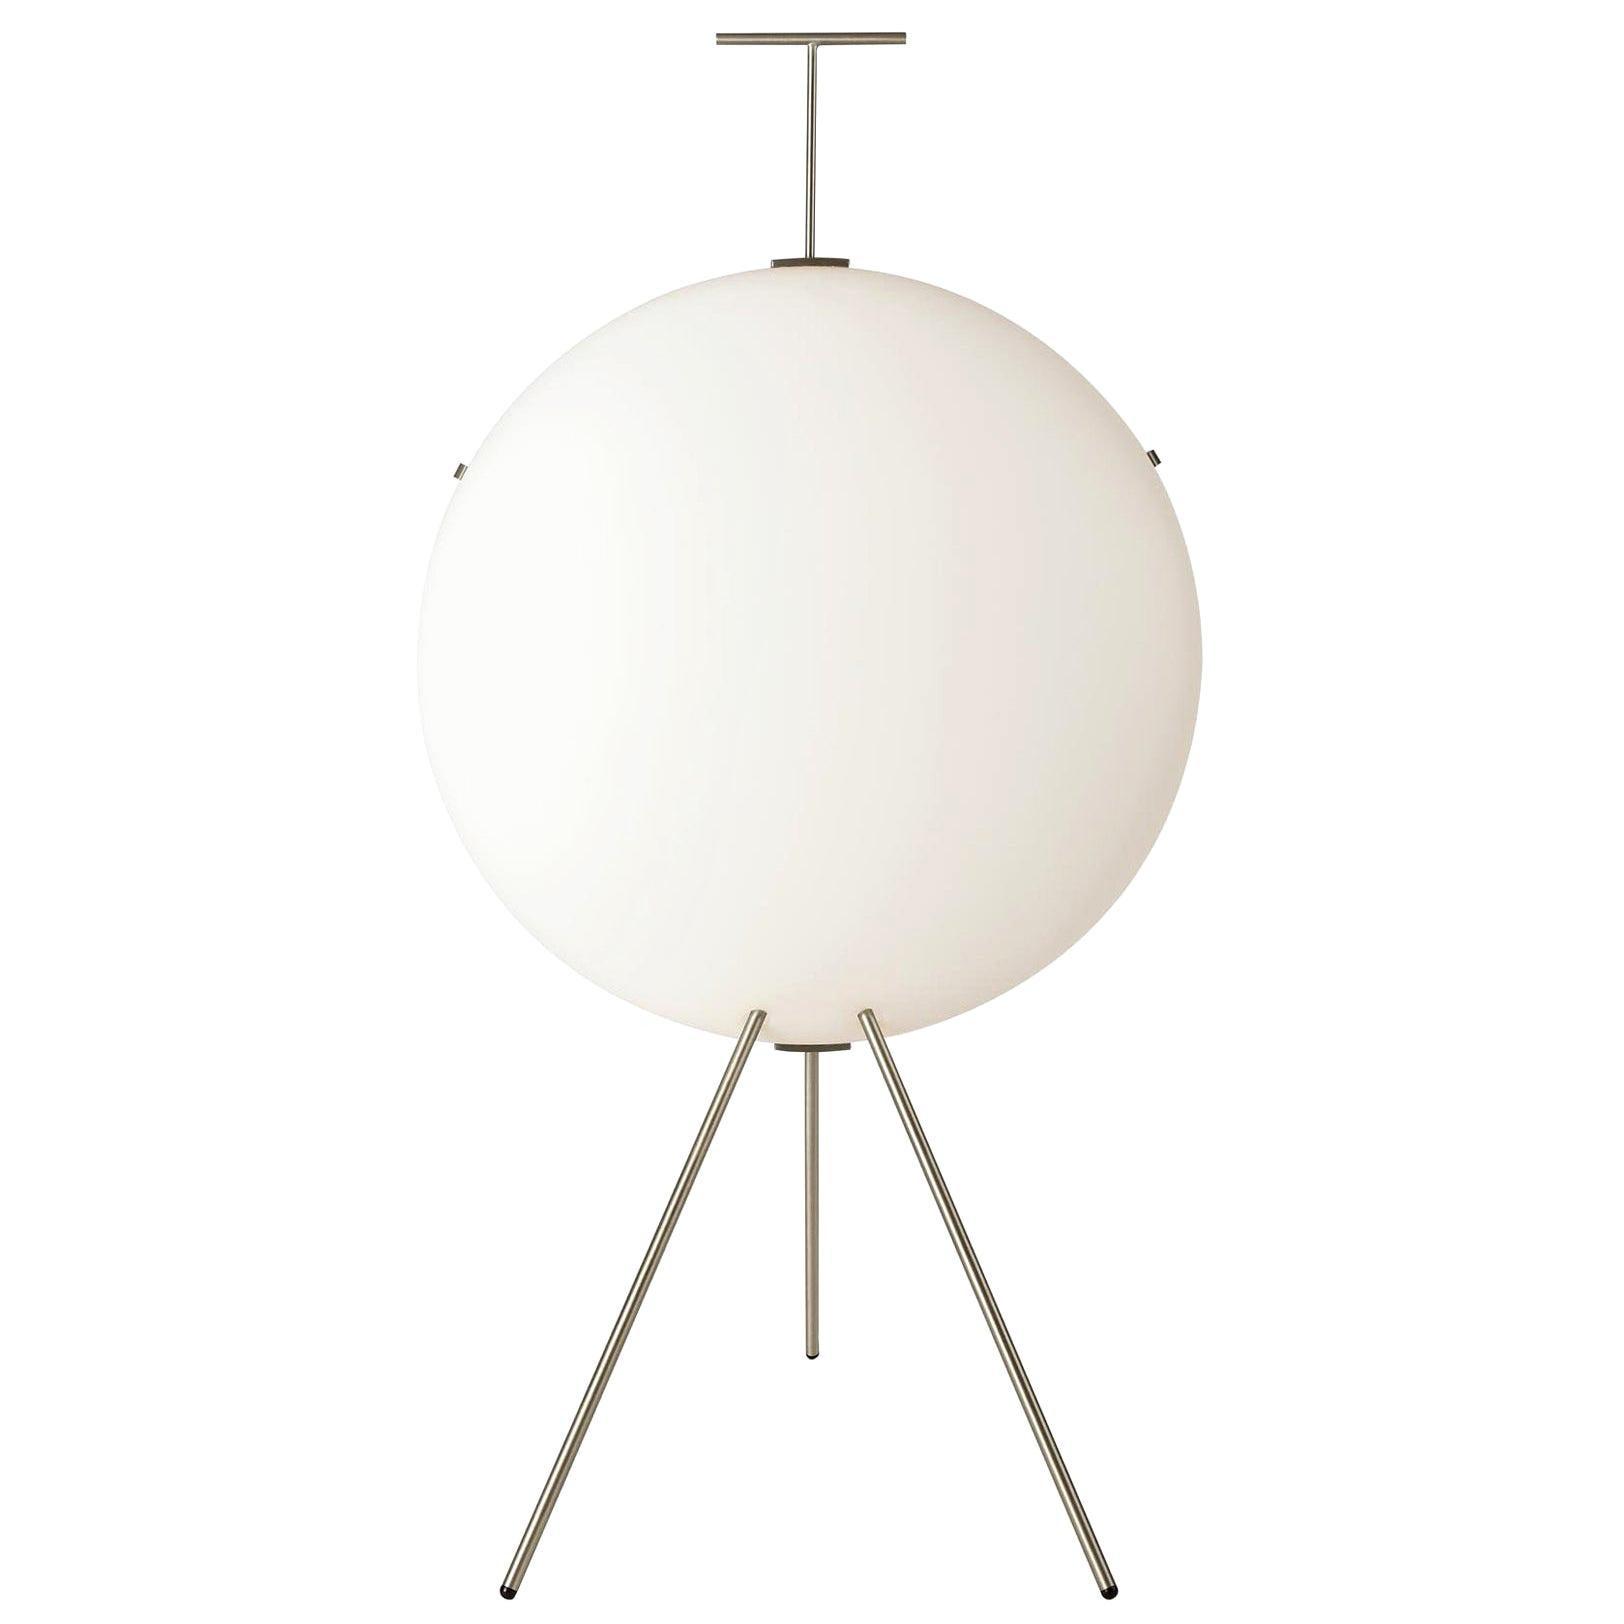 Gio Ponti Luna Verticale Floor Lamp in Nickel